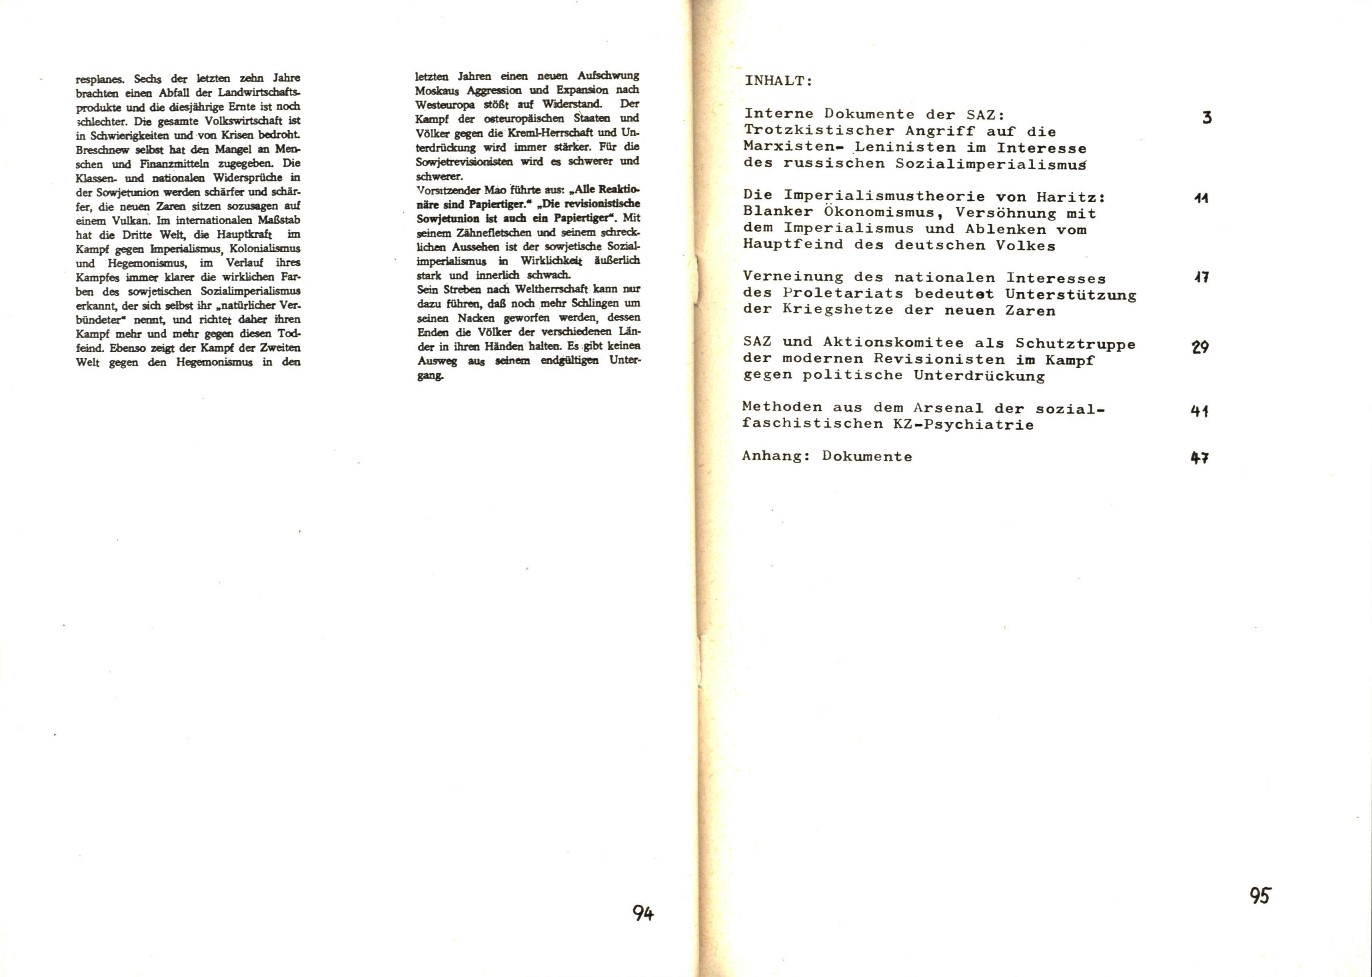 Berlin_KSV_1975_Dokumente_der_SAZ_49